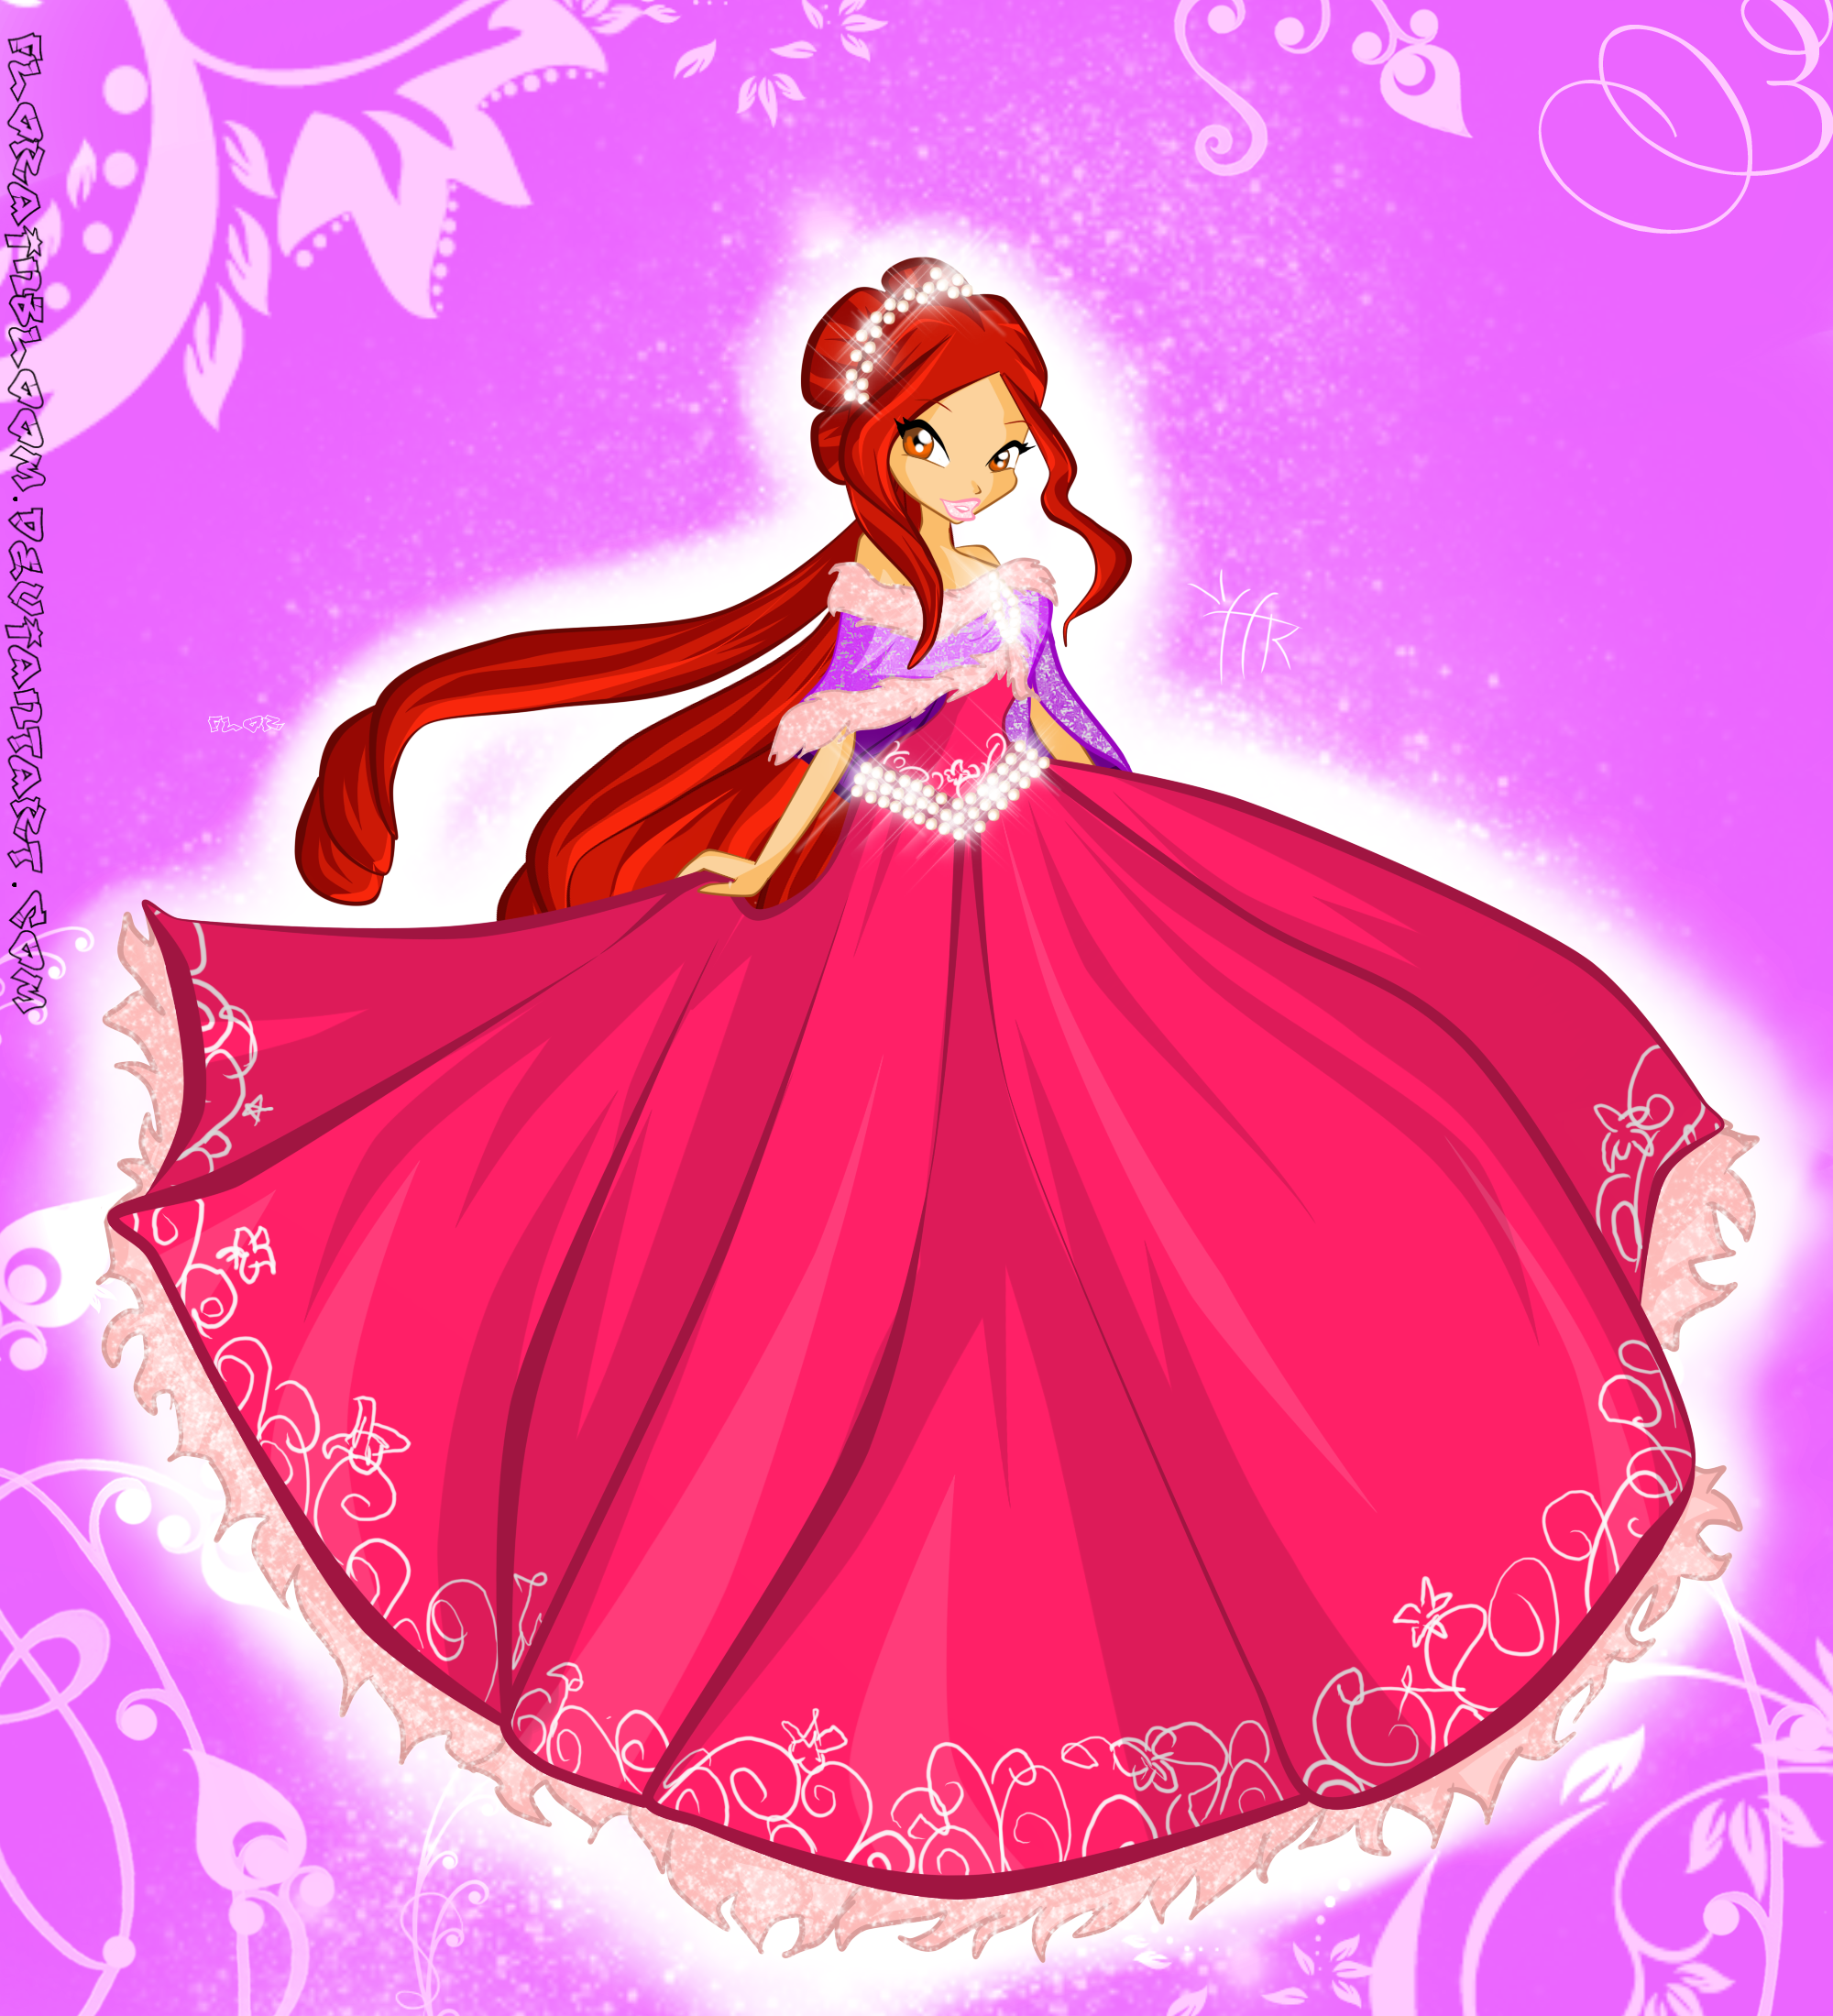 Winter princess naila by winx pinterest winx club winter - Princesse winx ...